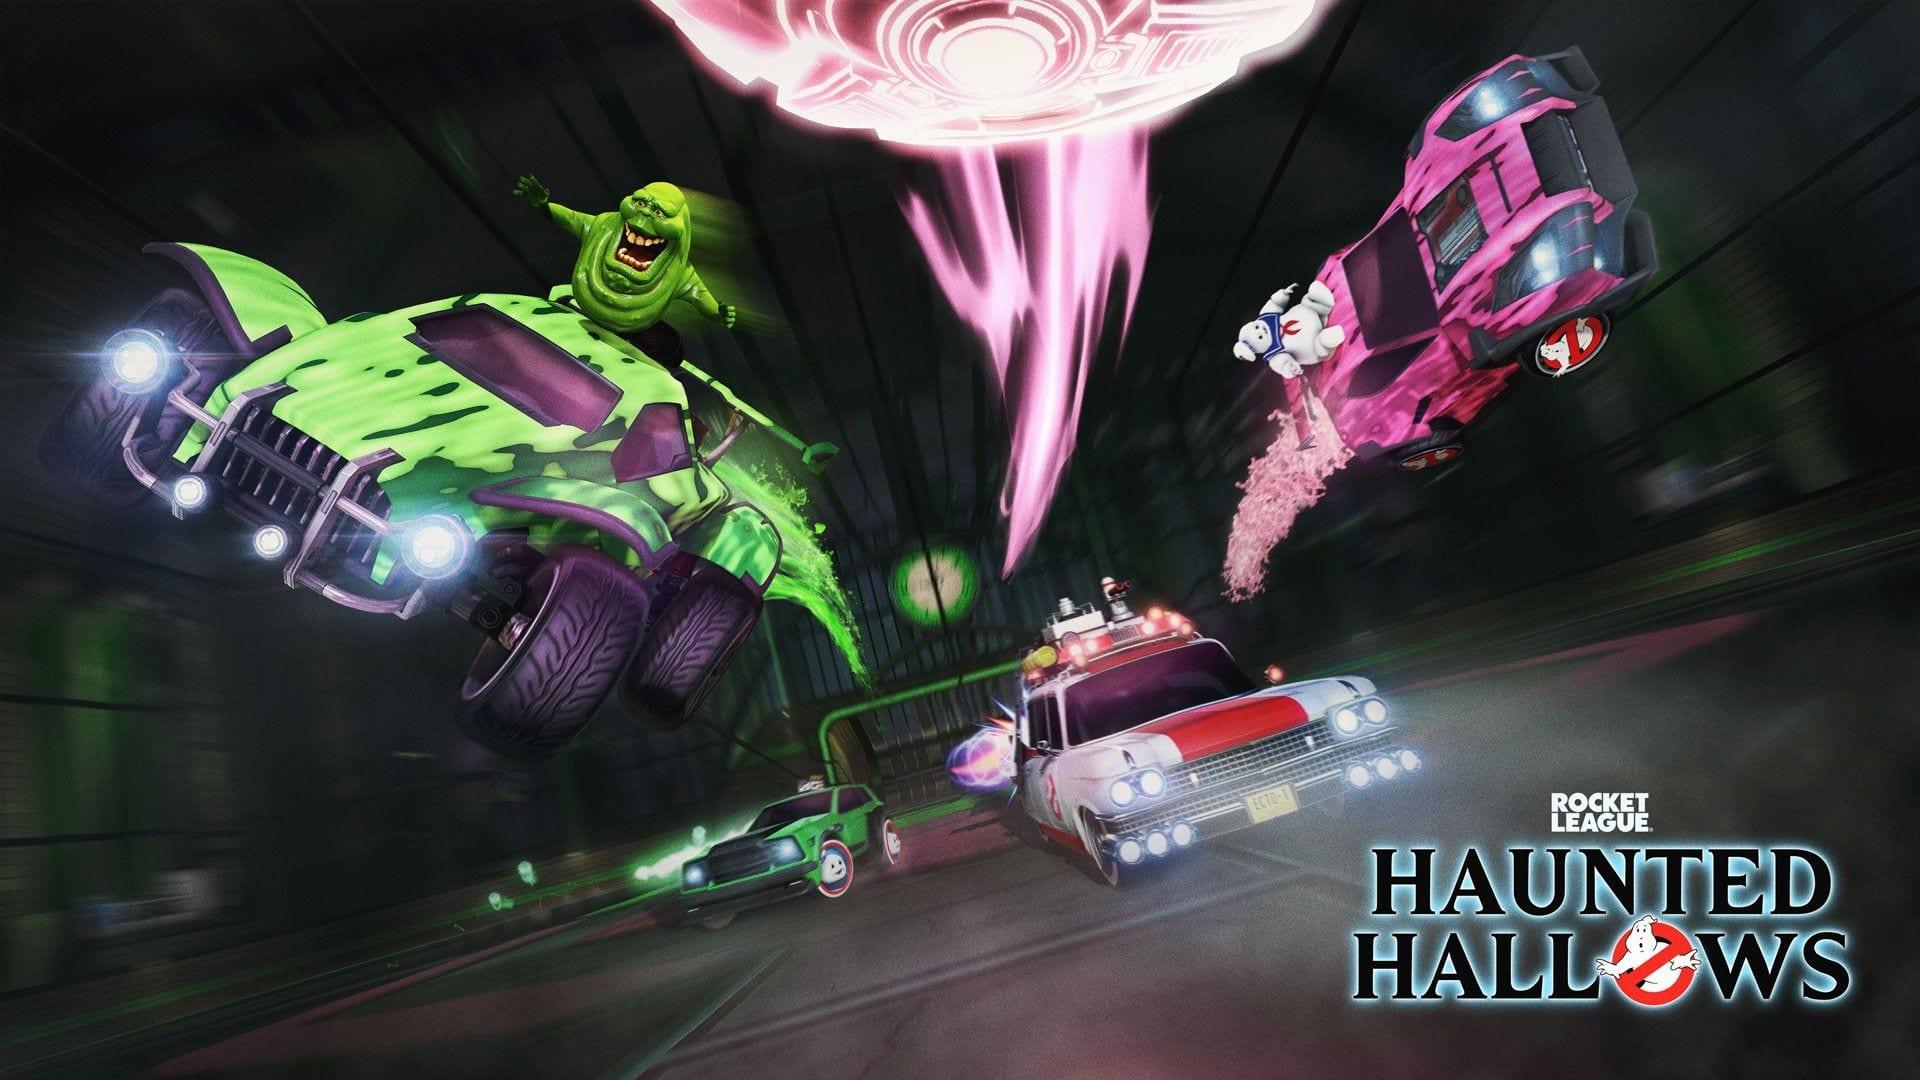 Rocket-League-Haunted-Hallows